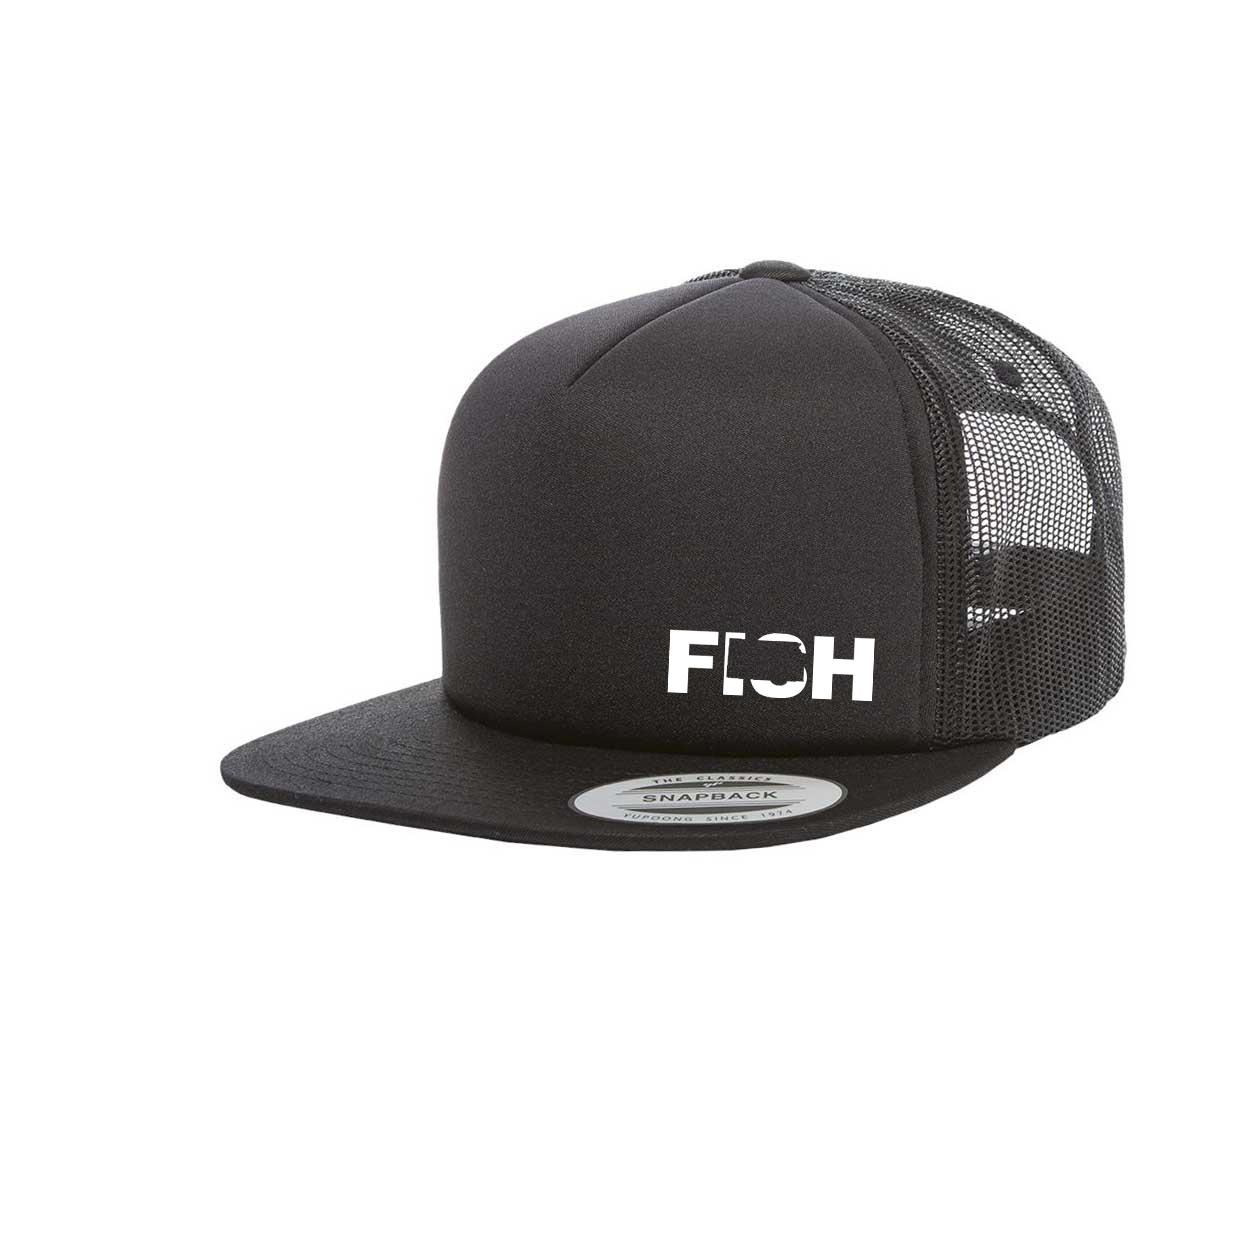 Fish Kansas Night Out Premium Foam Flat Brim Snapback Hat Black (White Logo)